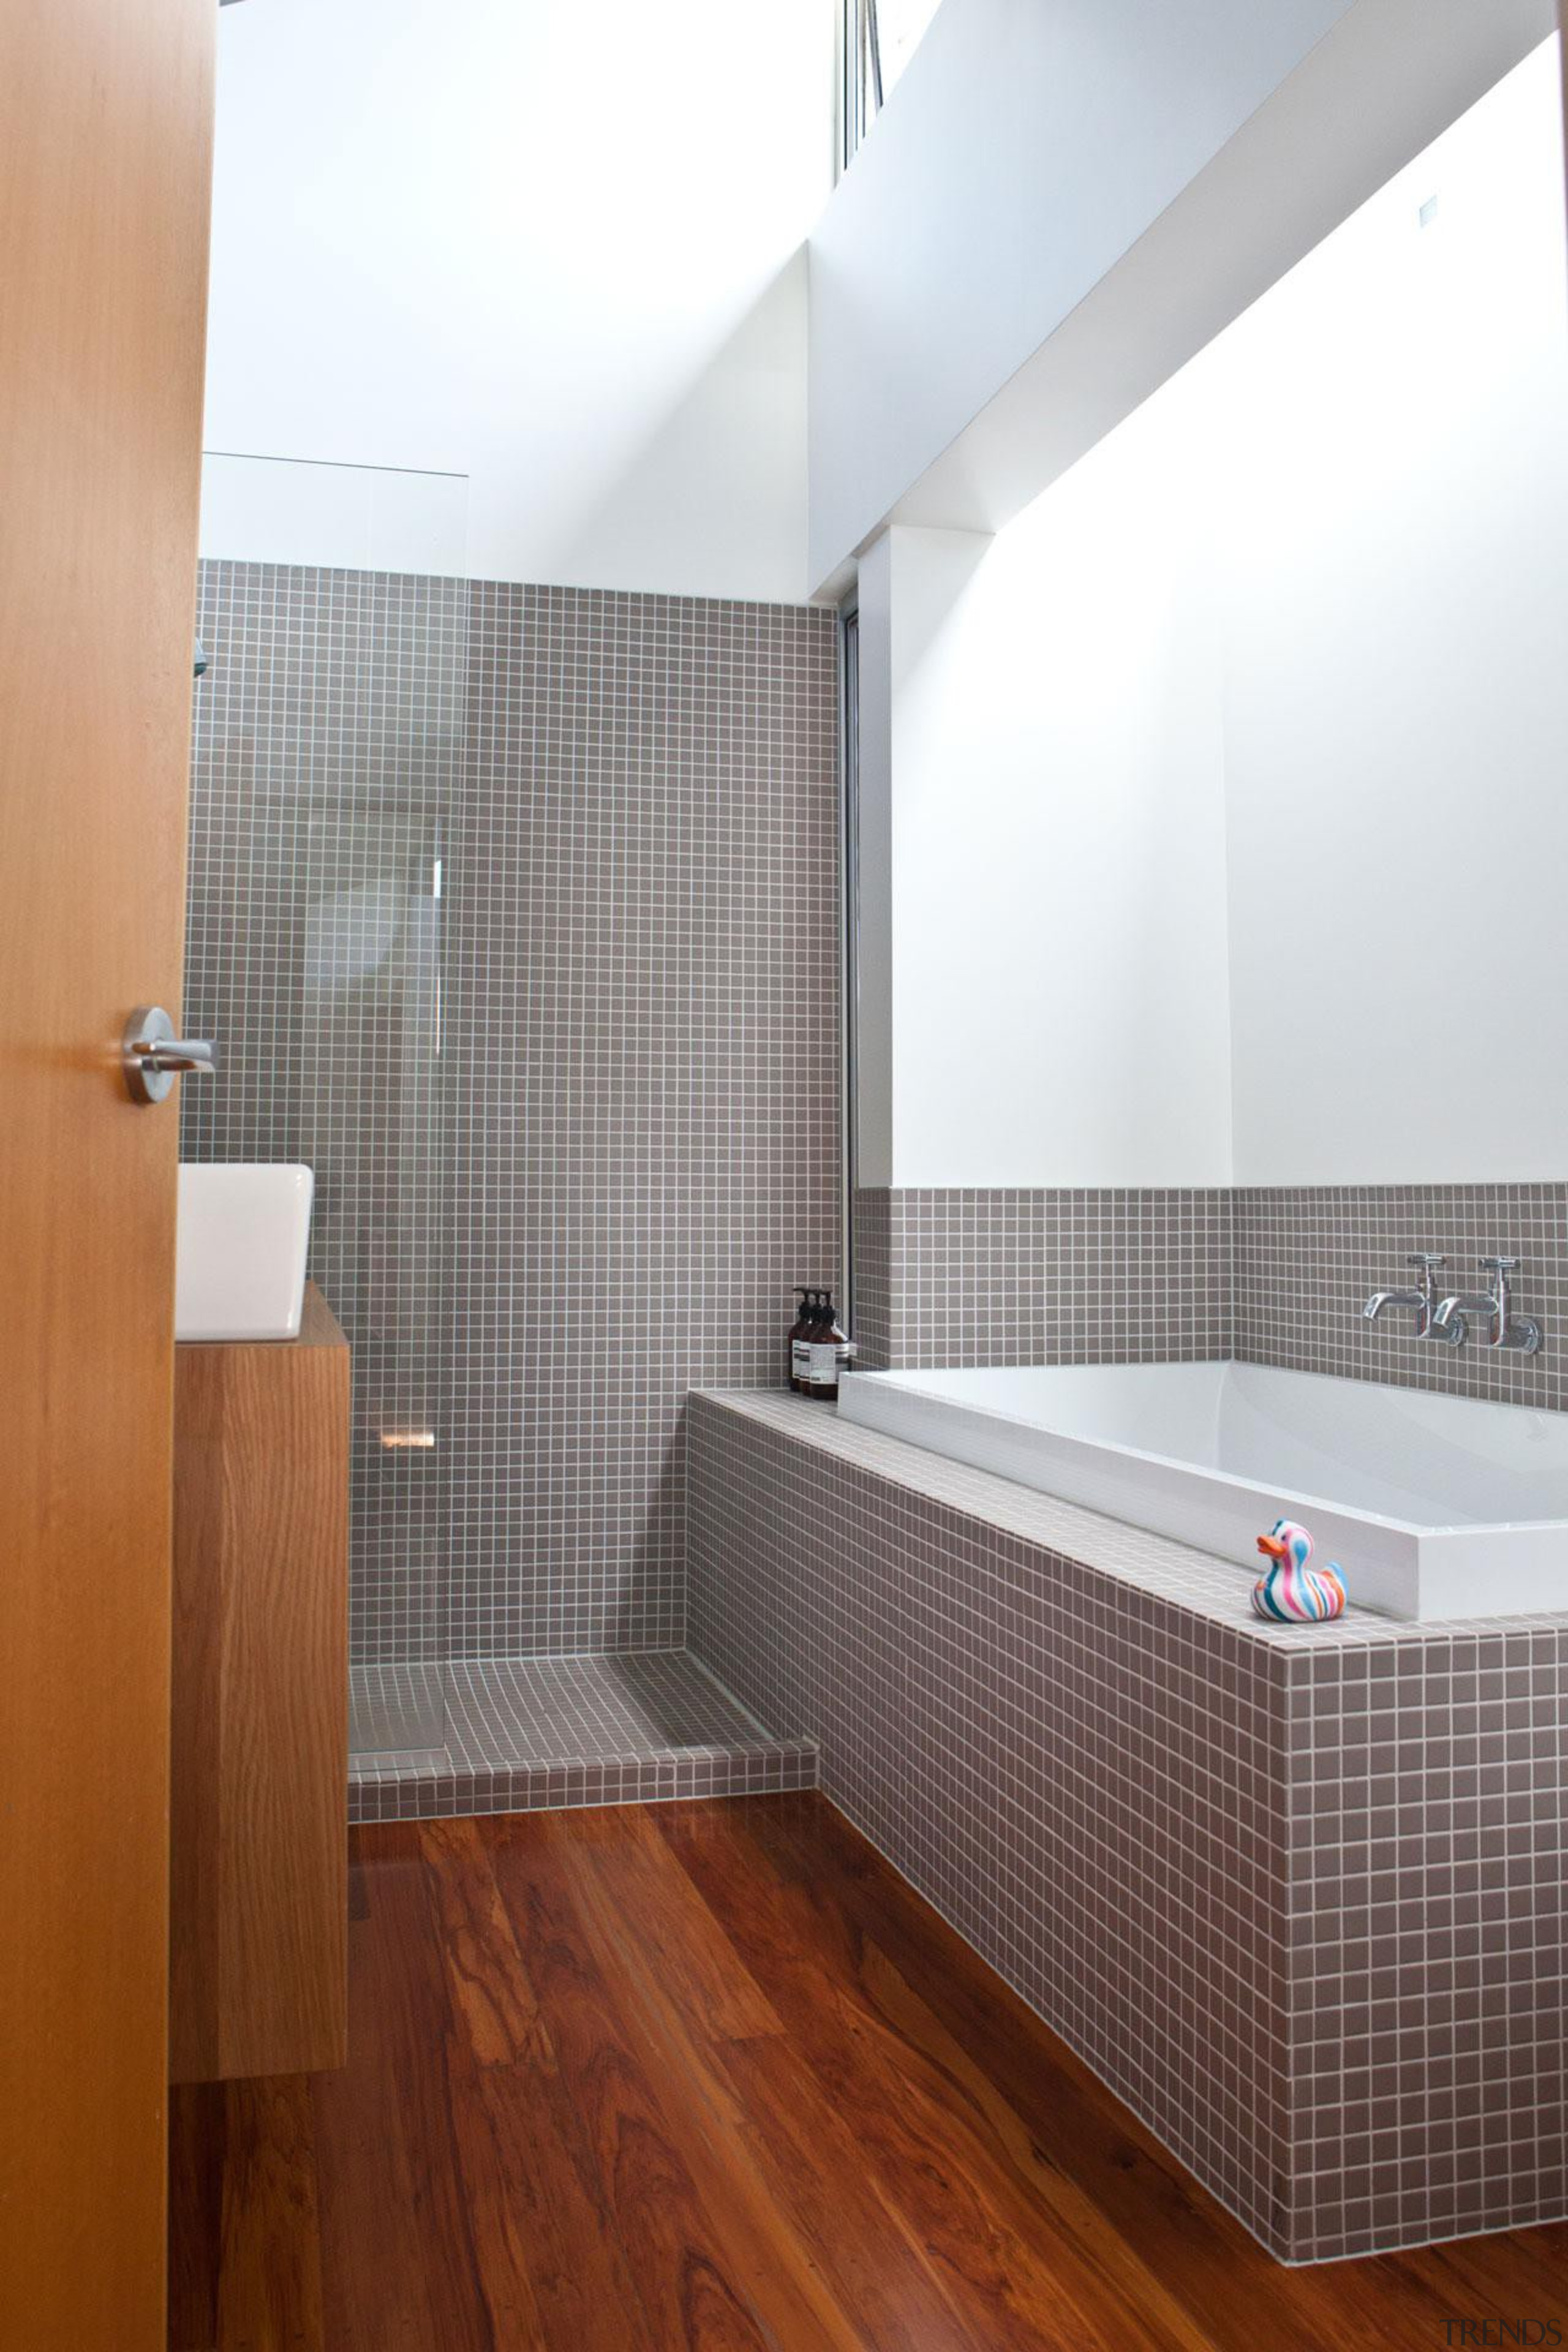 The oak vanity and timber floors provide a architecture, bathroom, daylighting, floor, flooring, interior design, laminate flooring, room, tile, wall, wood flooring, white